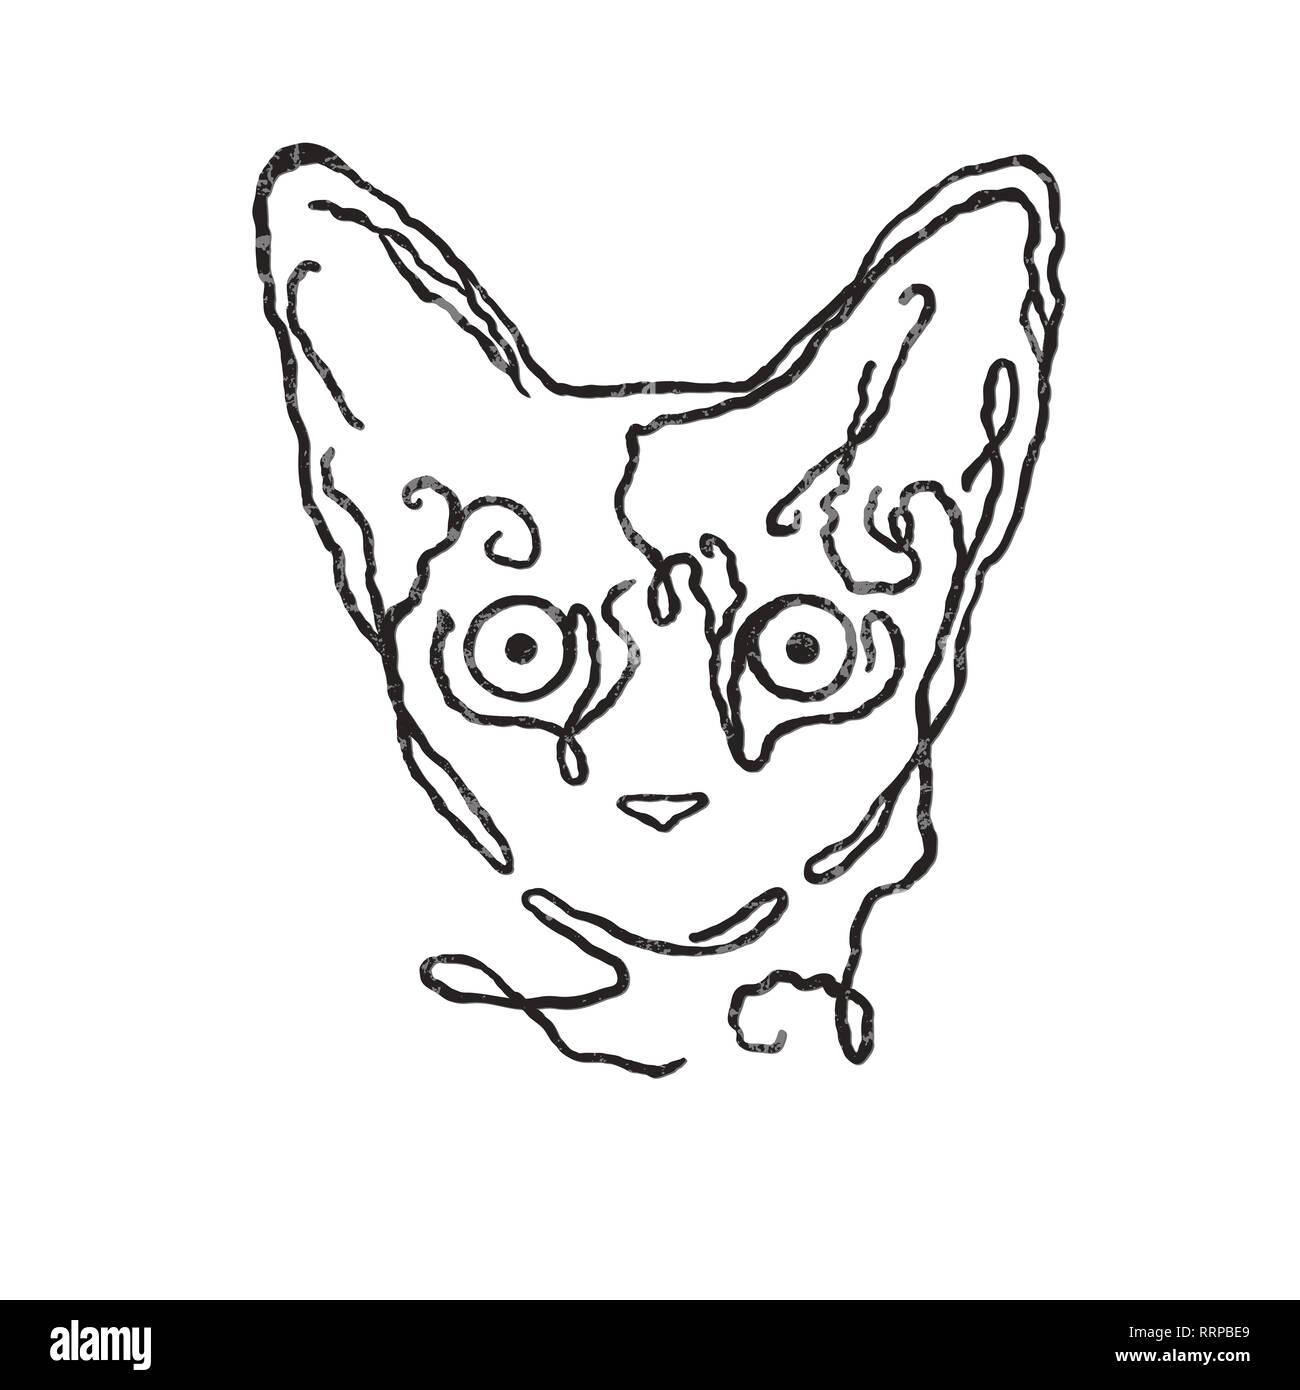 Dessin Vectoriel Illustration Ligne Simple Design Chat